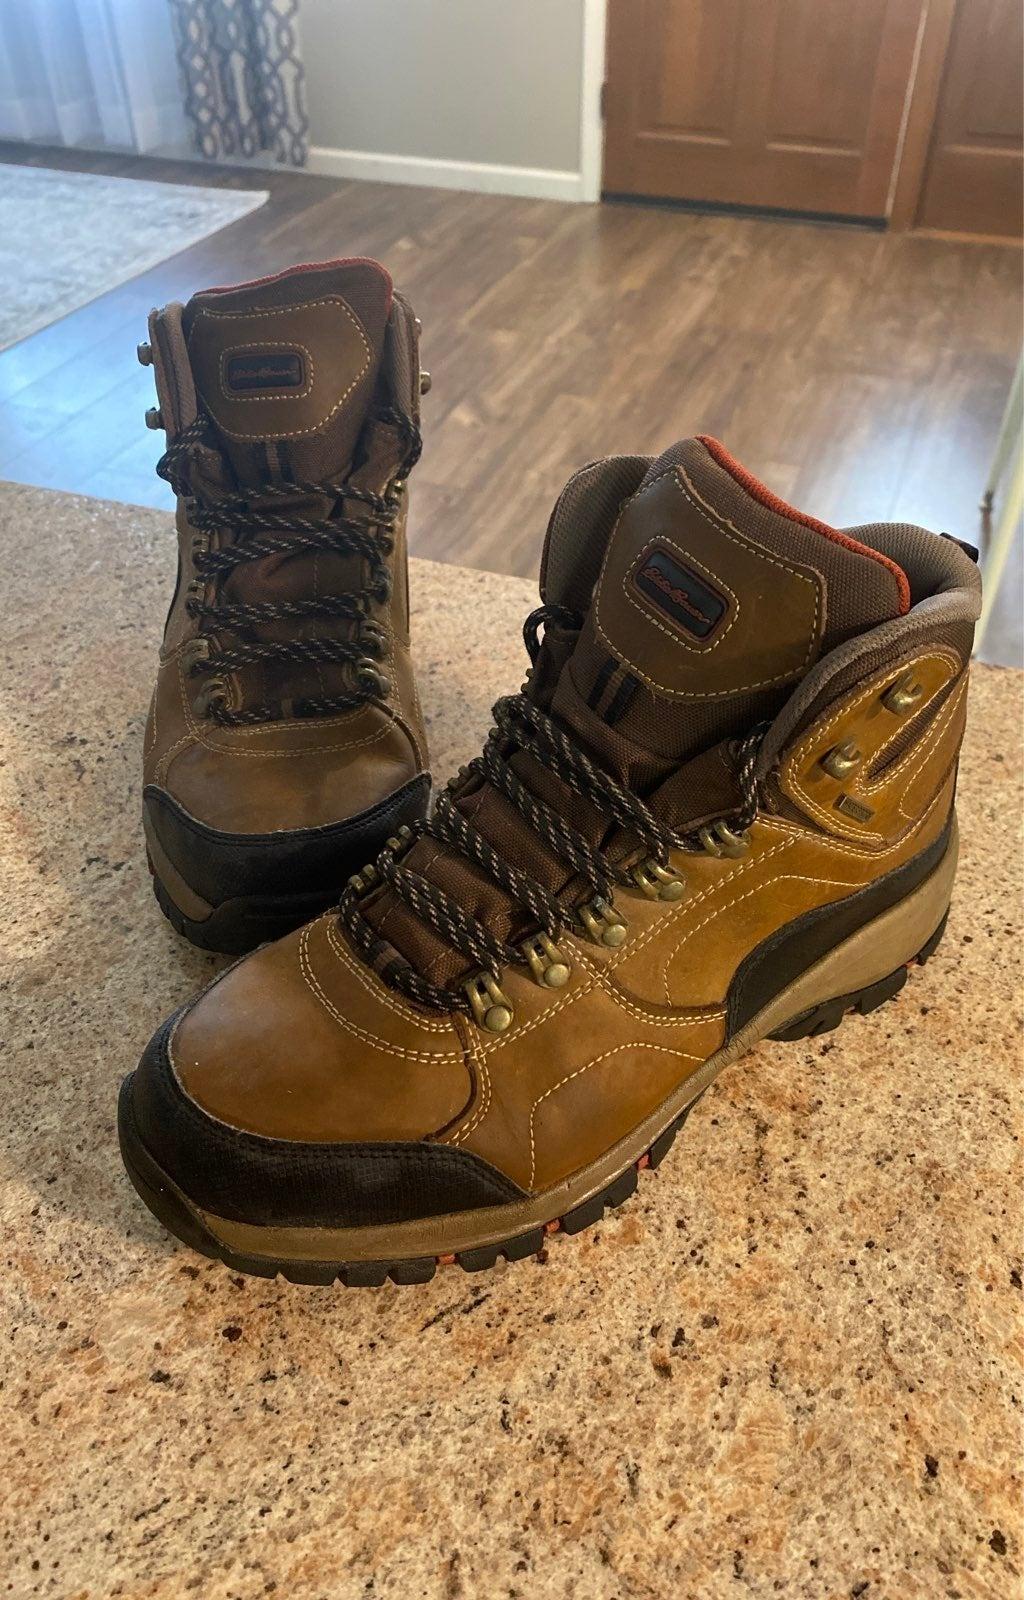 eddie bauer waterproof boots for men